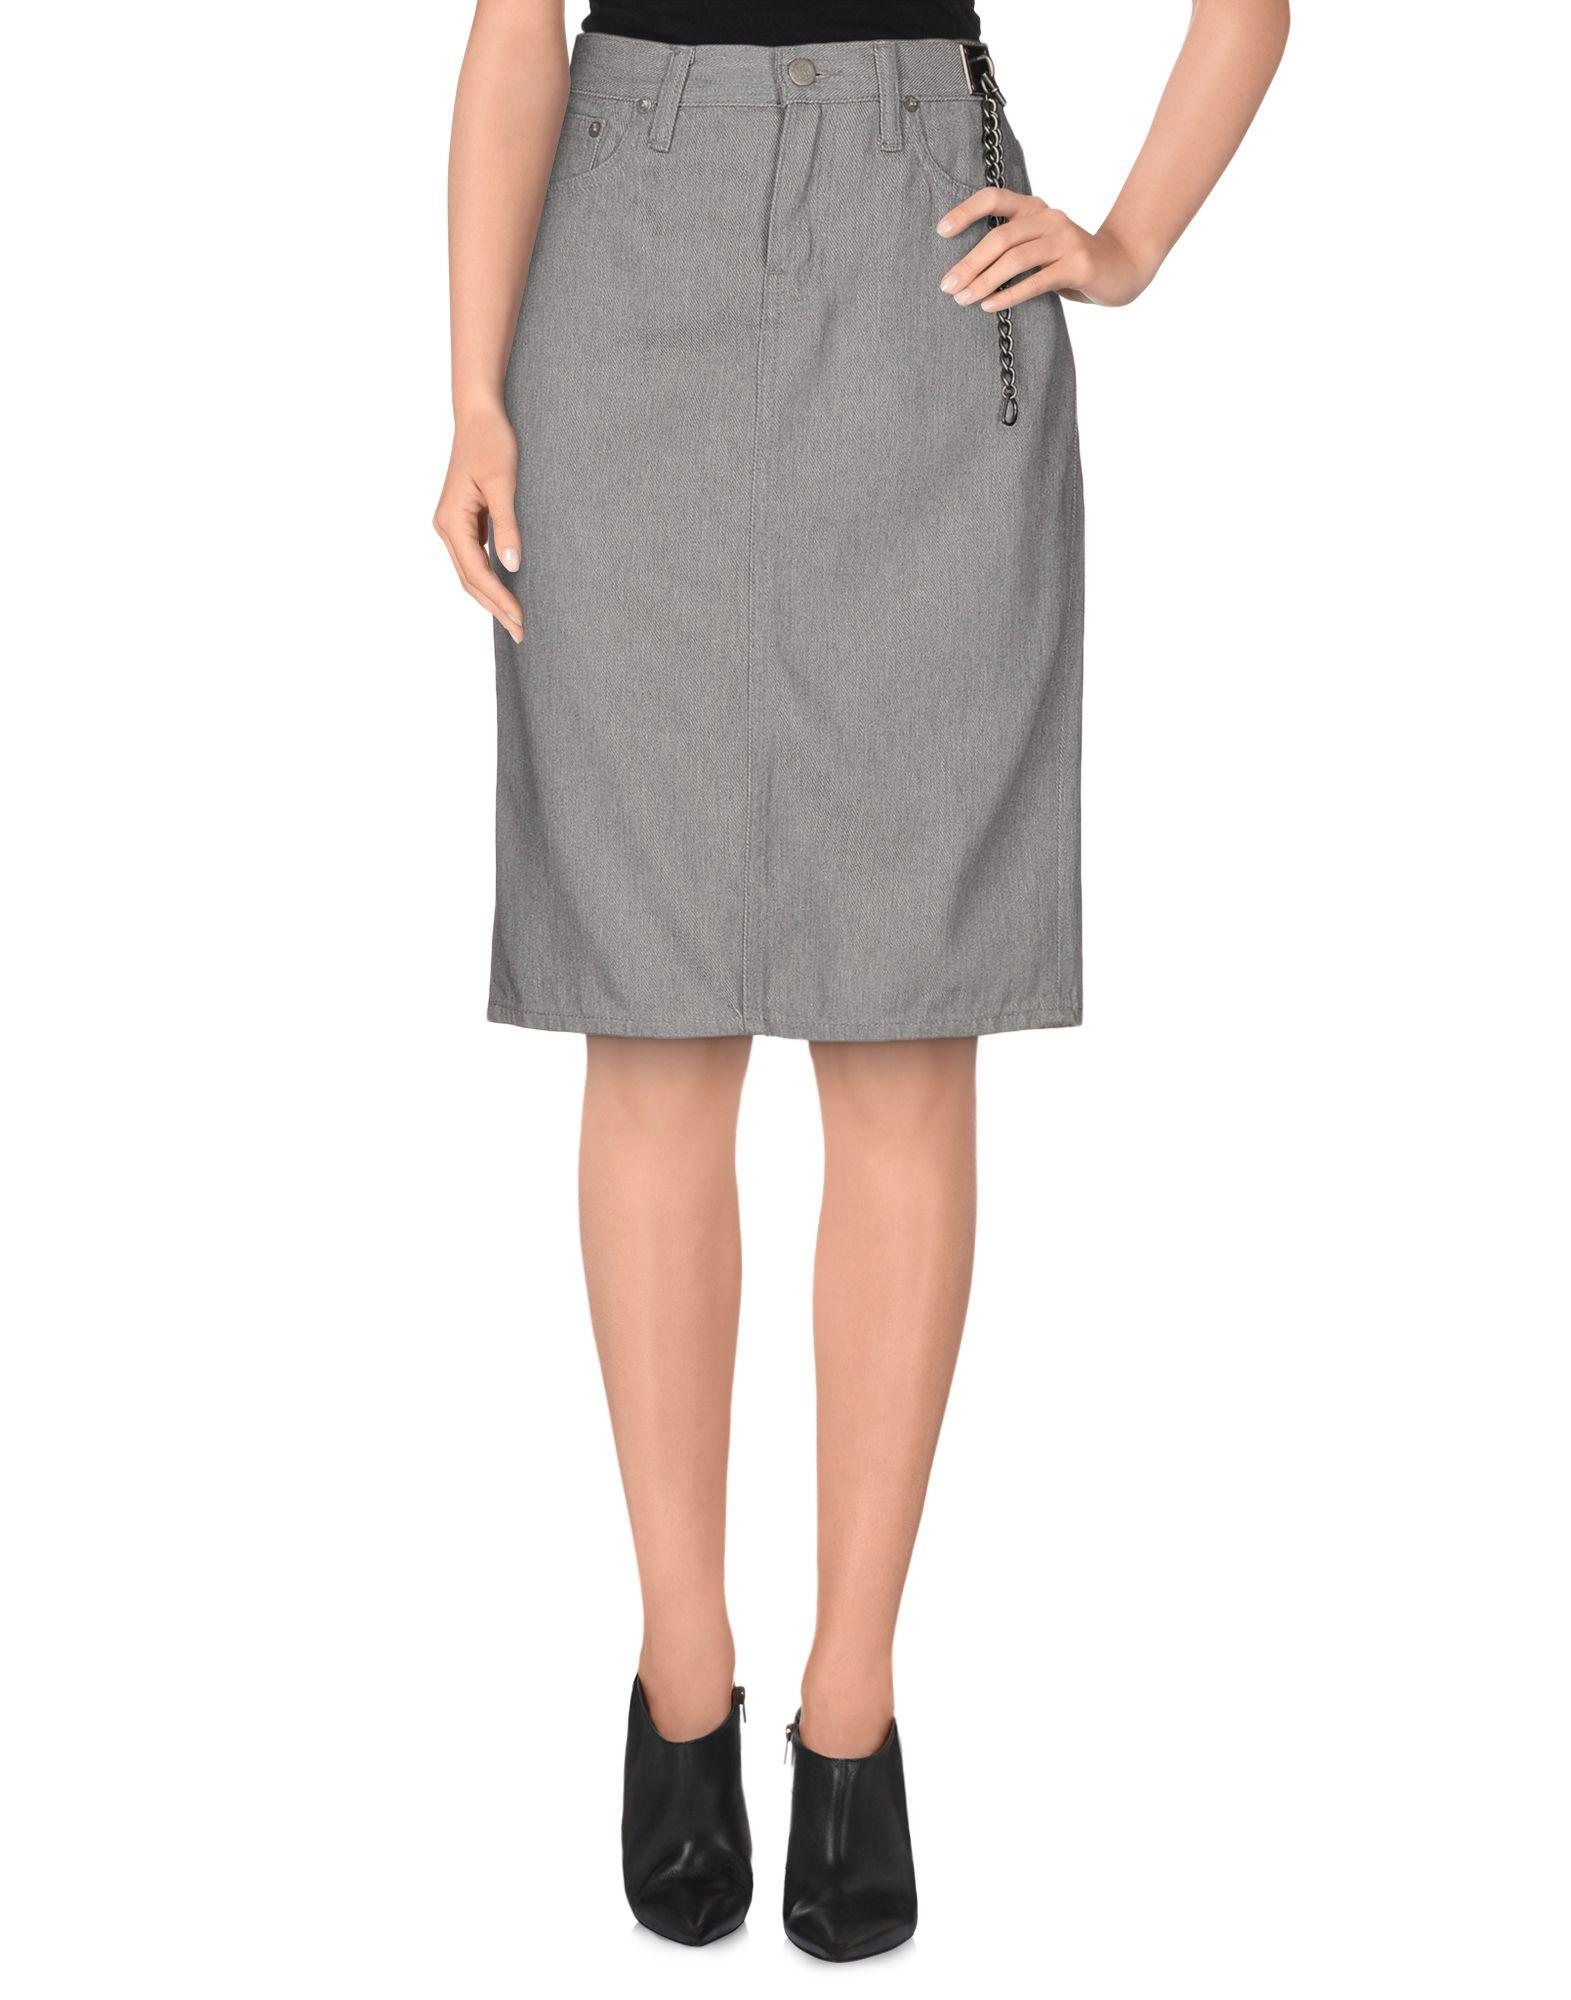 Ralph lauren Denim Skirt in Gray | Lyst